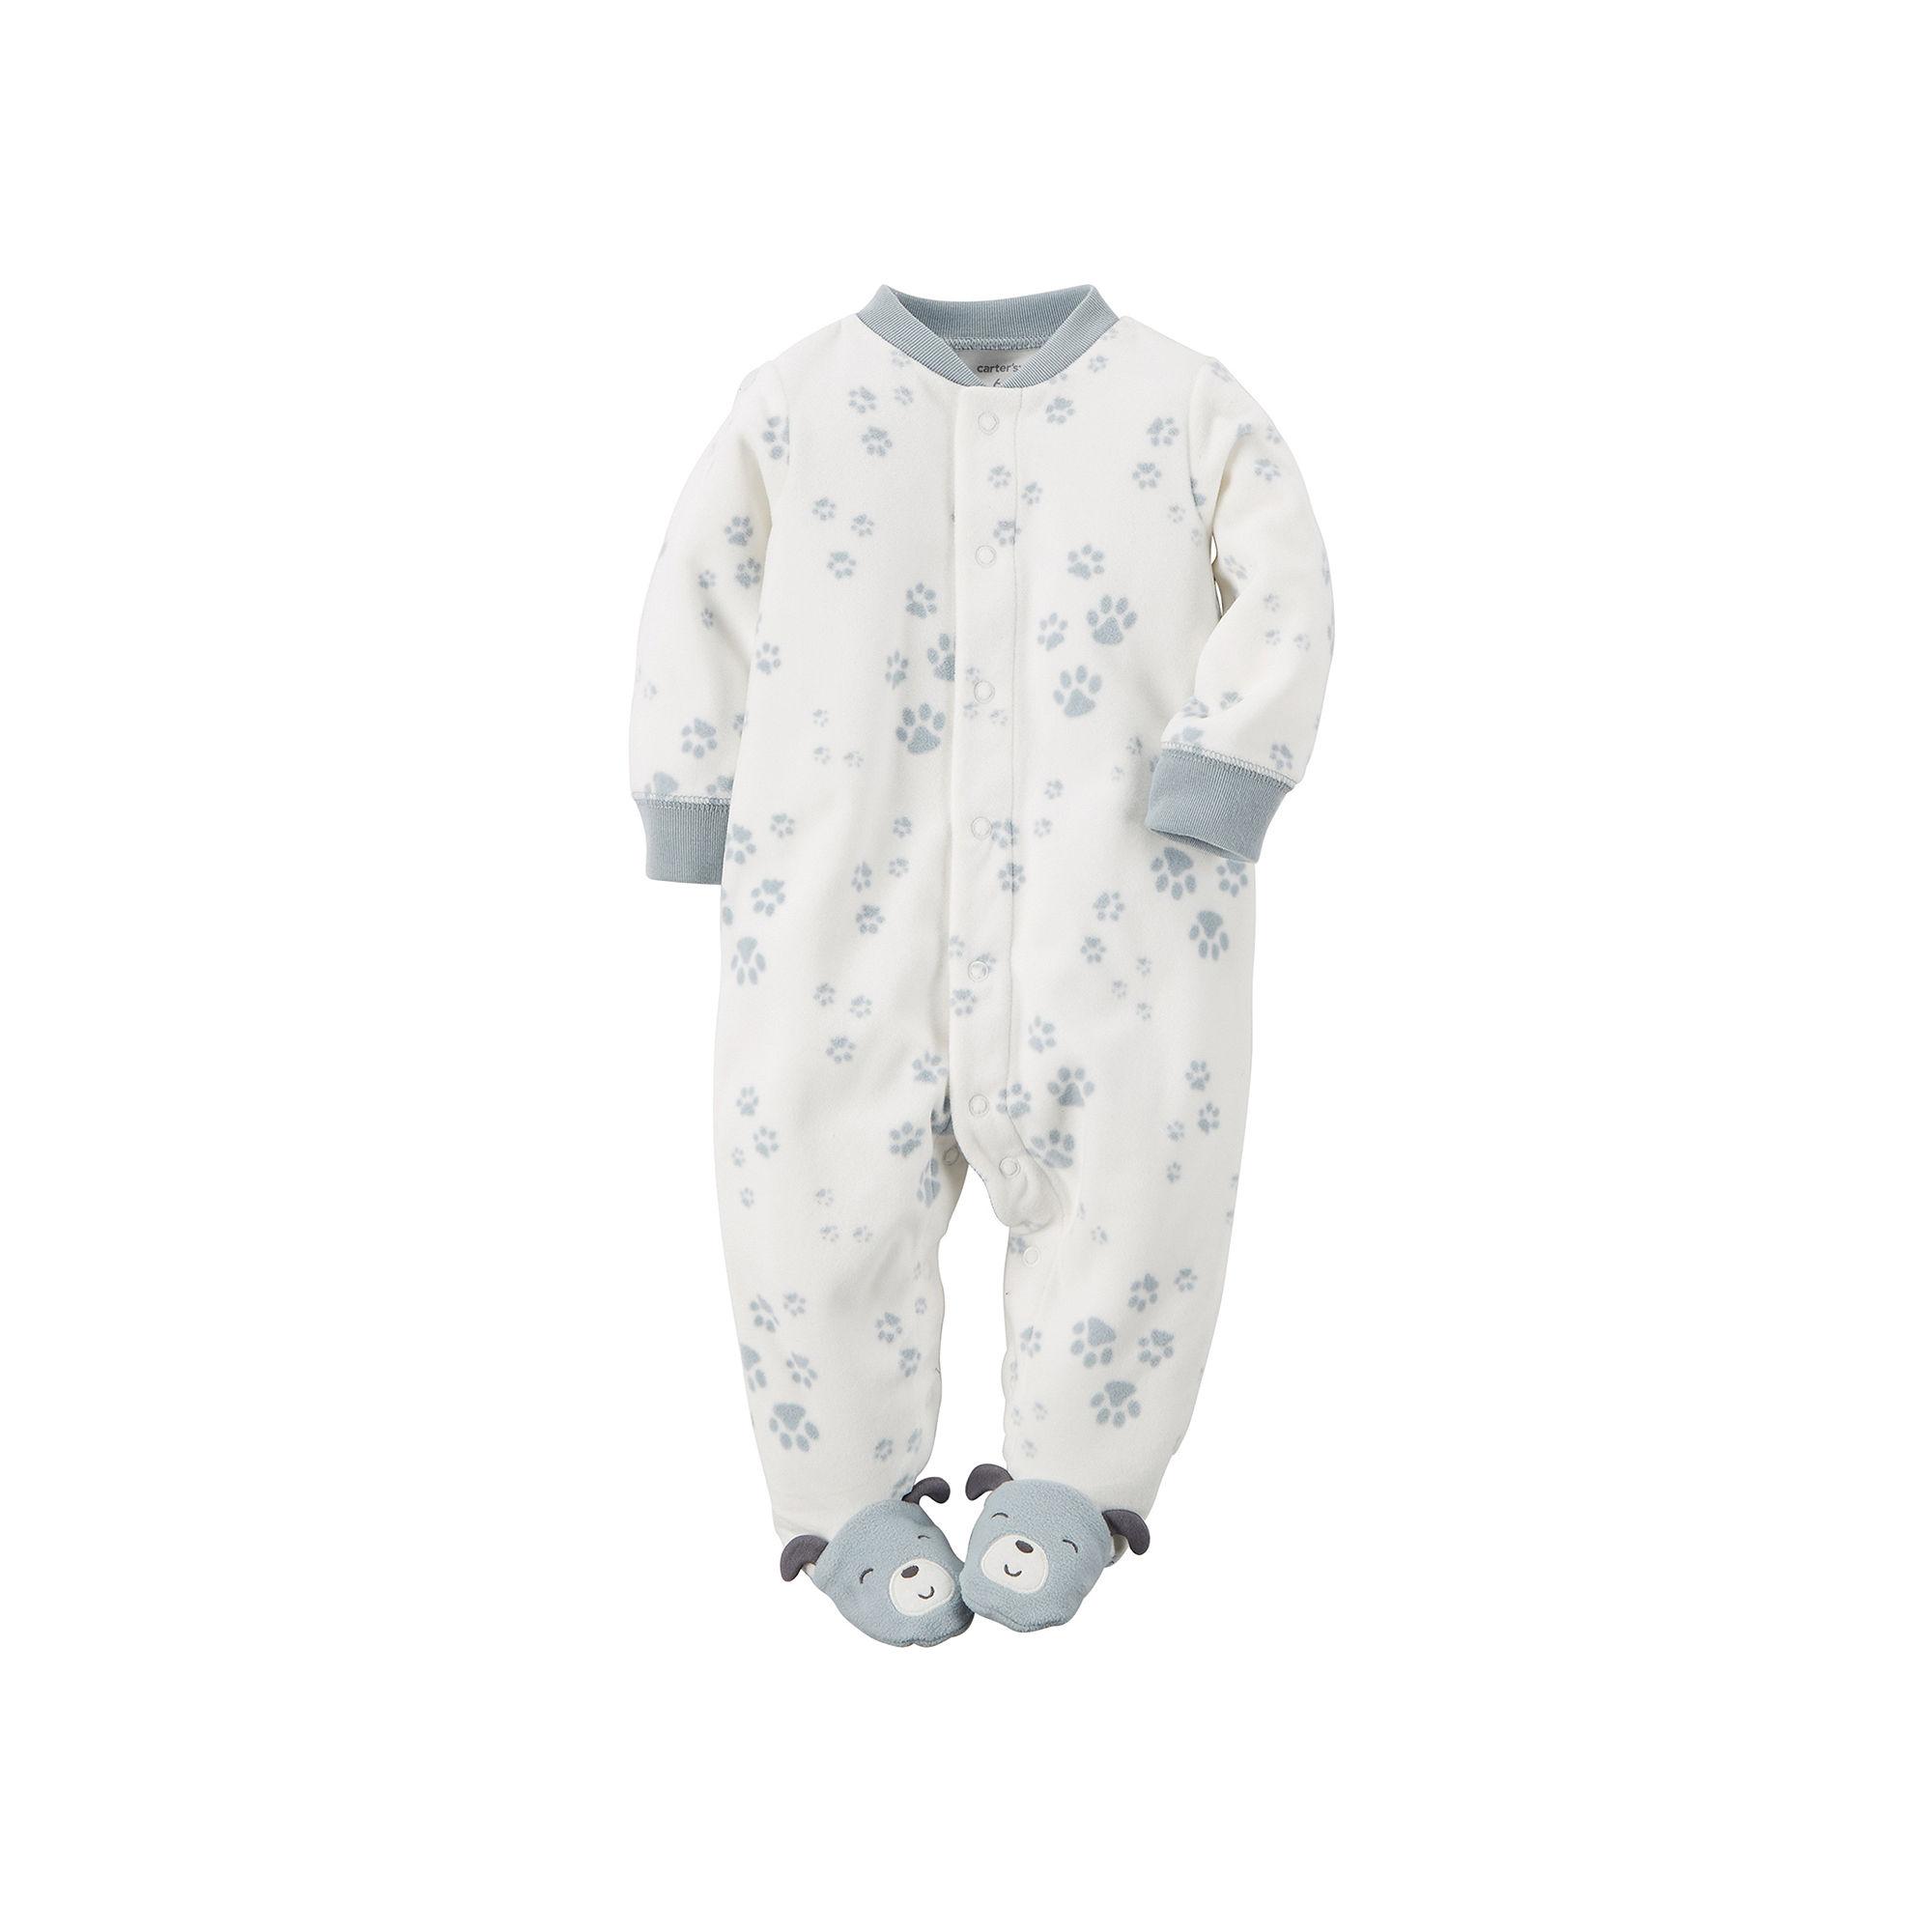 cbf8d9a5d7d1 UPC 888510959212 - Carter s Fleece Puppy Sleep   Play - Baby Boys ...